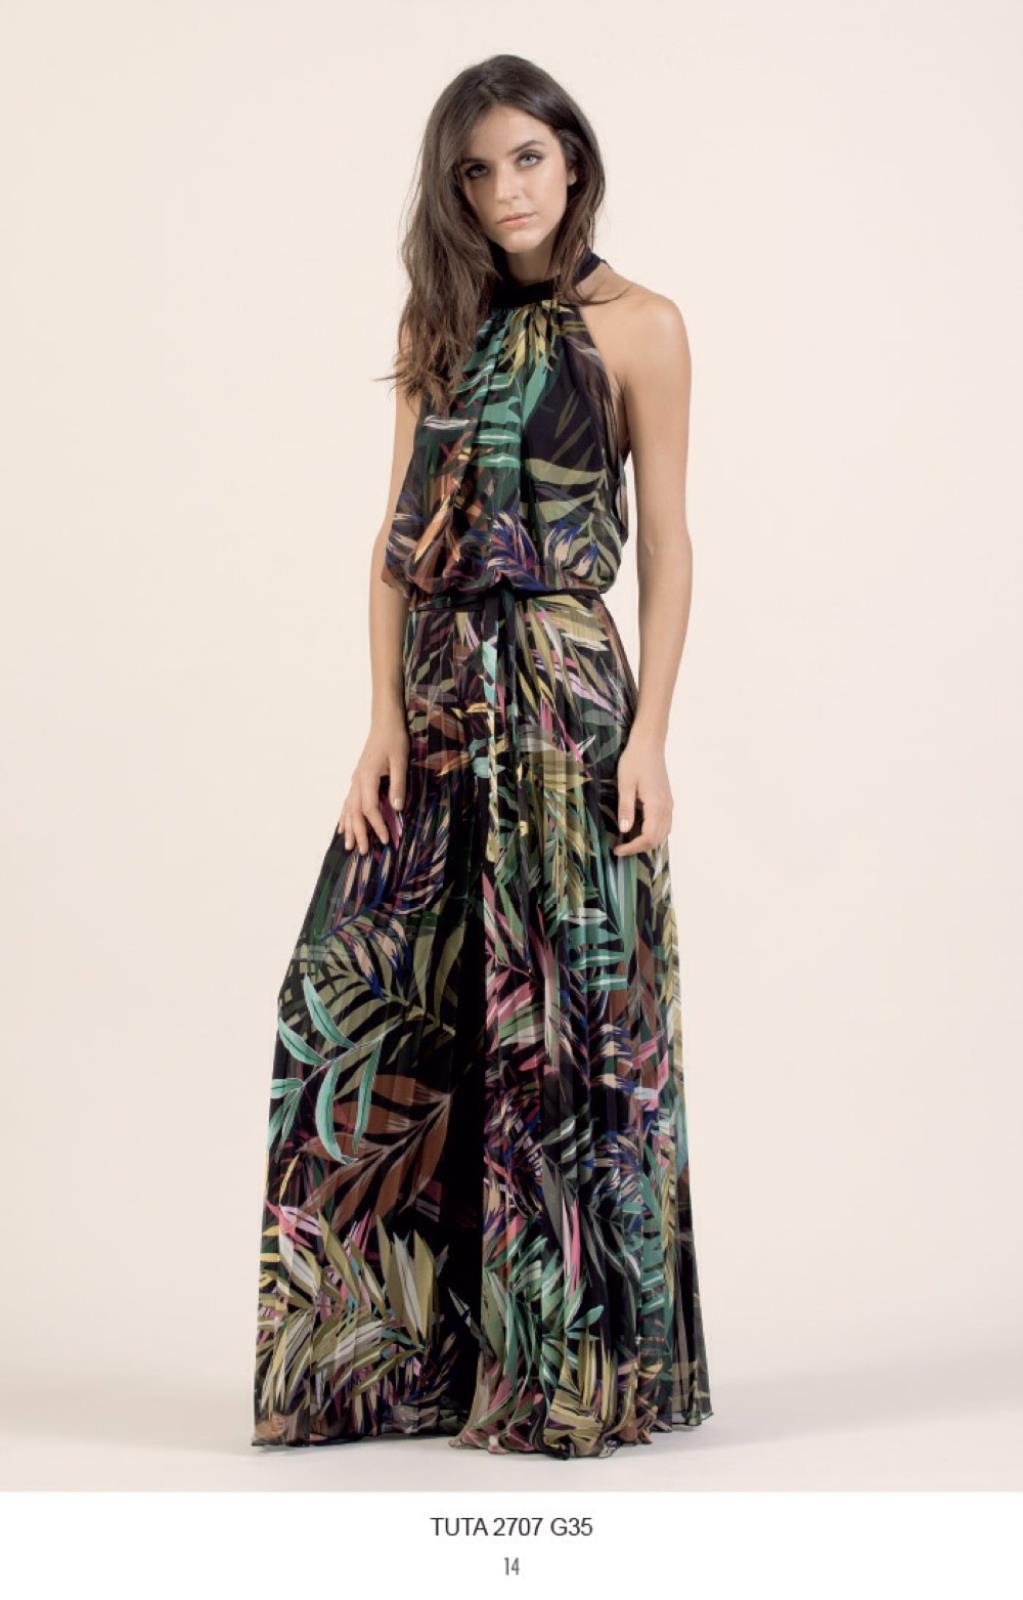 finest selection 57dc5 f05ec Carla Montanarini Tuta Donna 2707 | Sanny Bell Shop Online